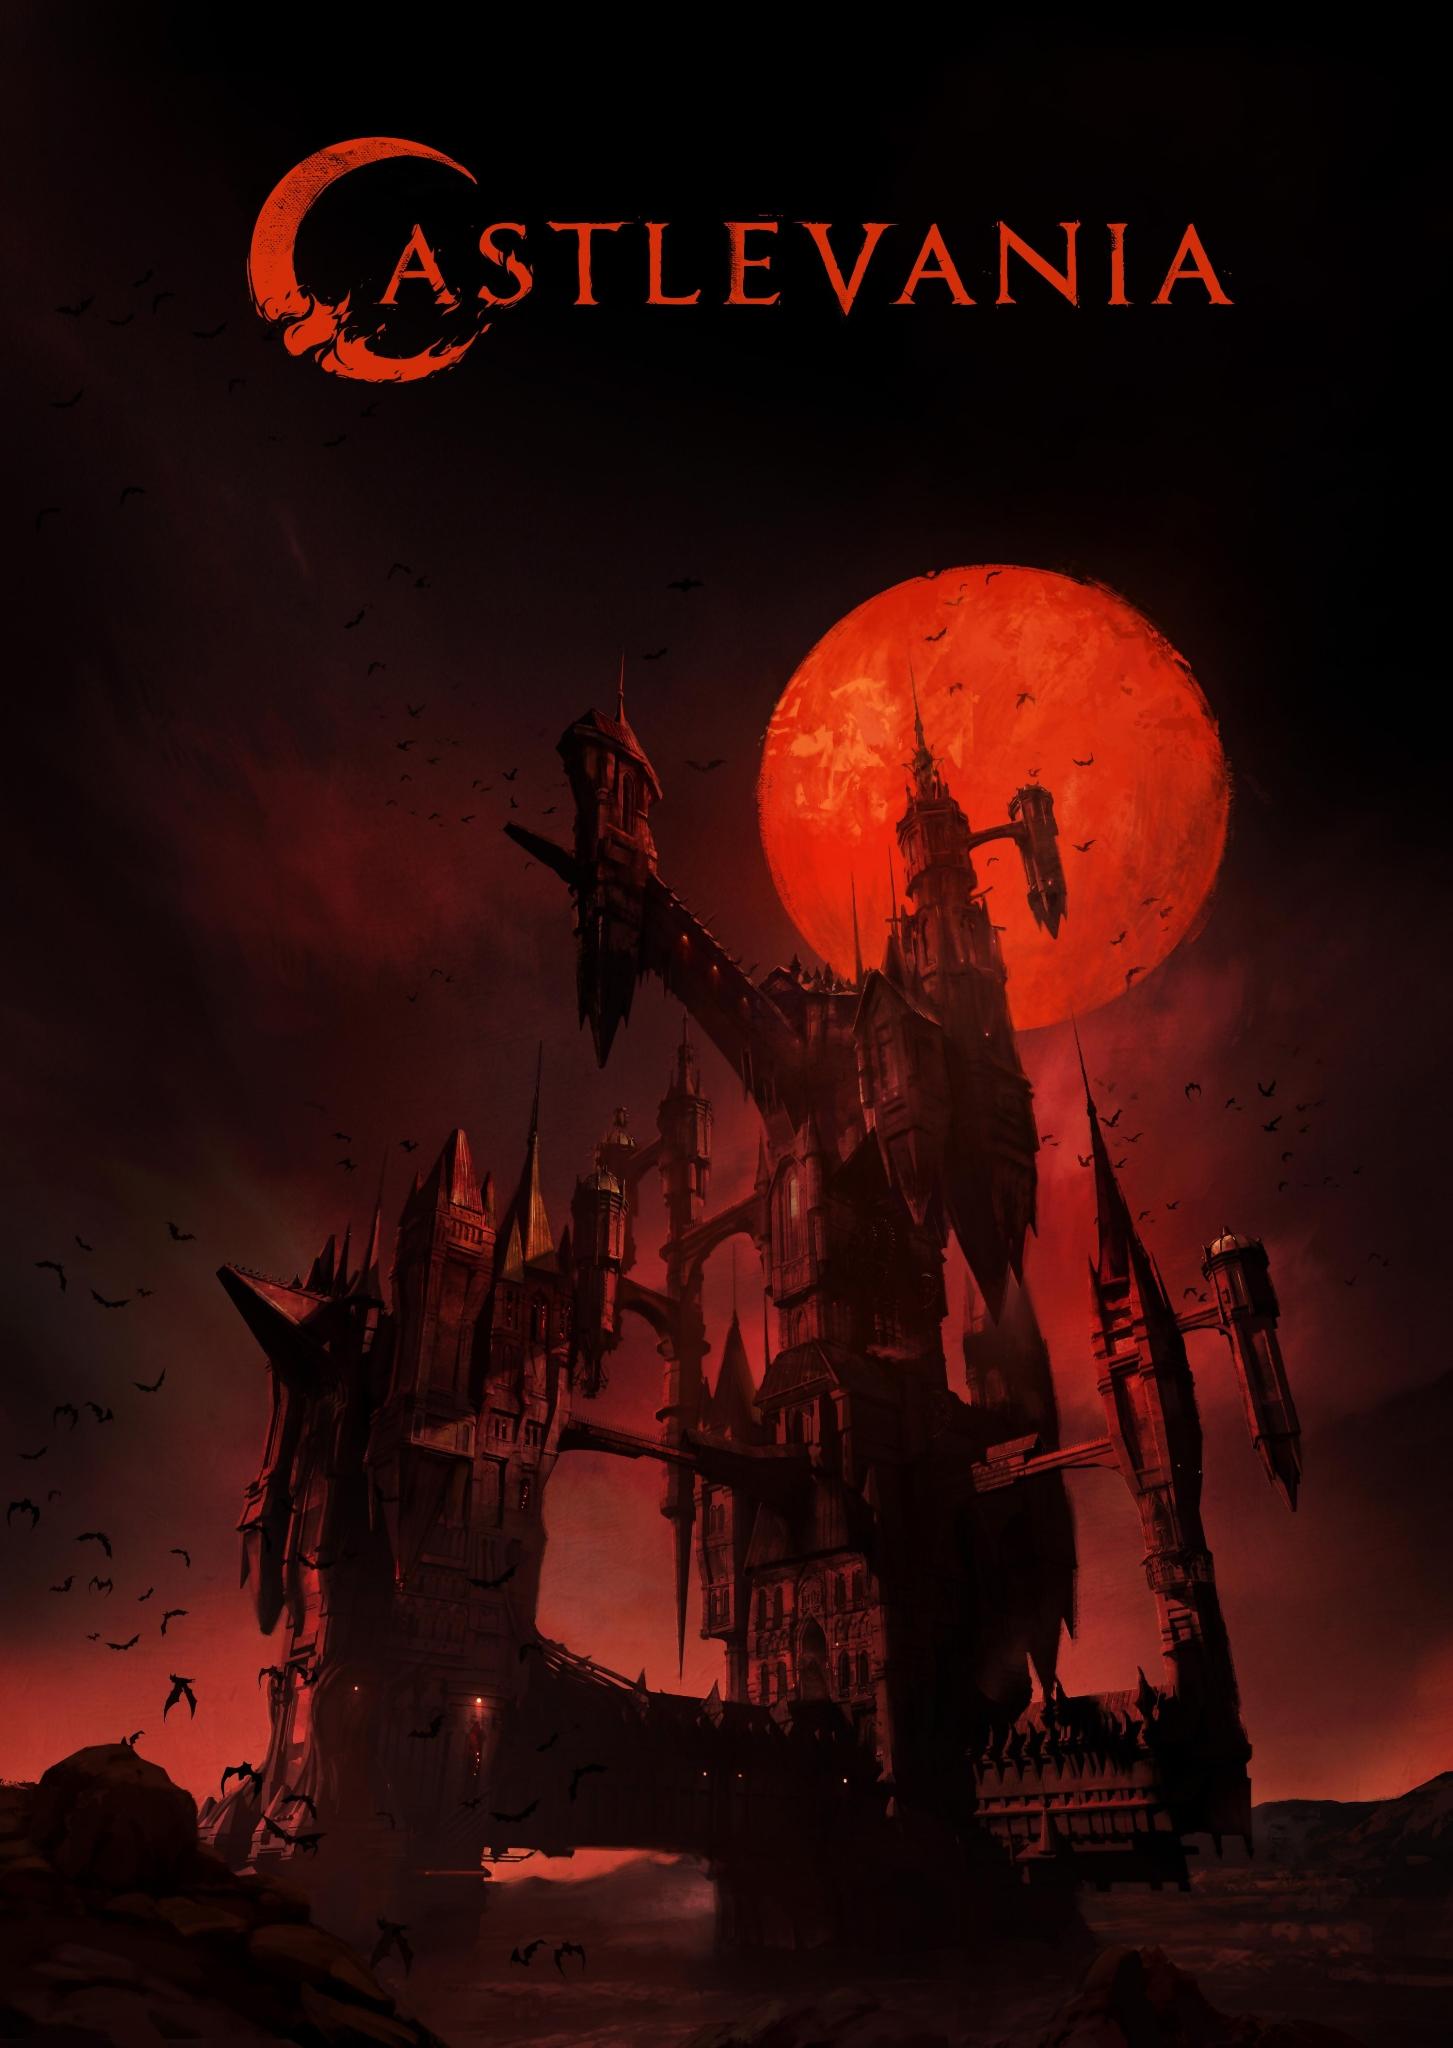 Castlevania | WEB-DL| Lat/Cast/Jap+Sub | 04/04| MKV-1080p | x264 Castlevania